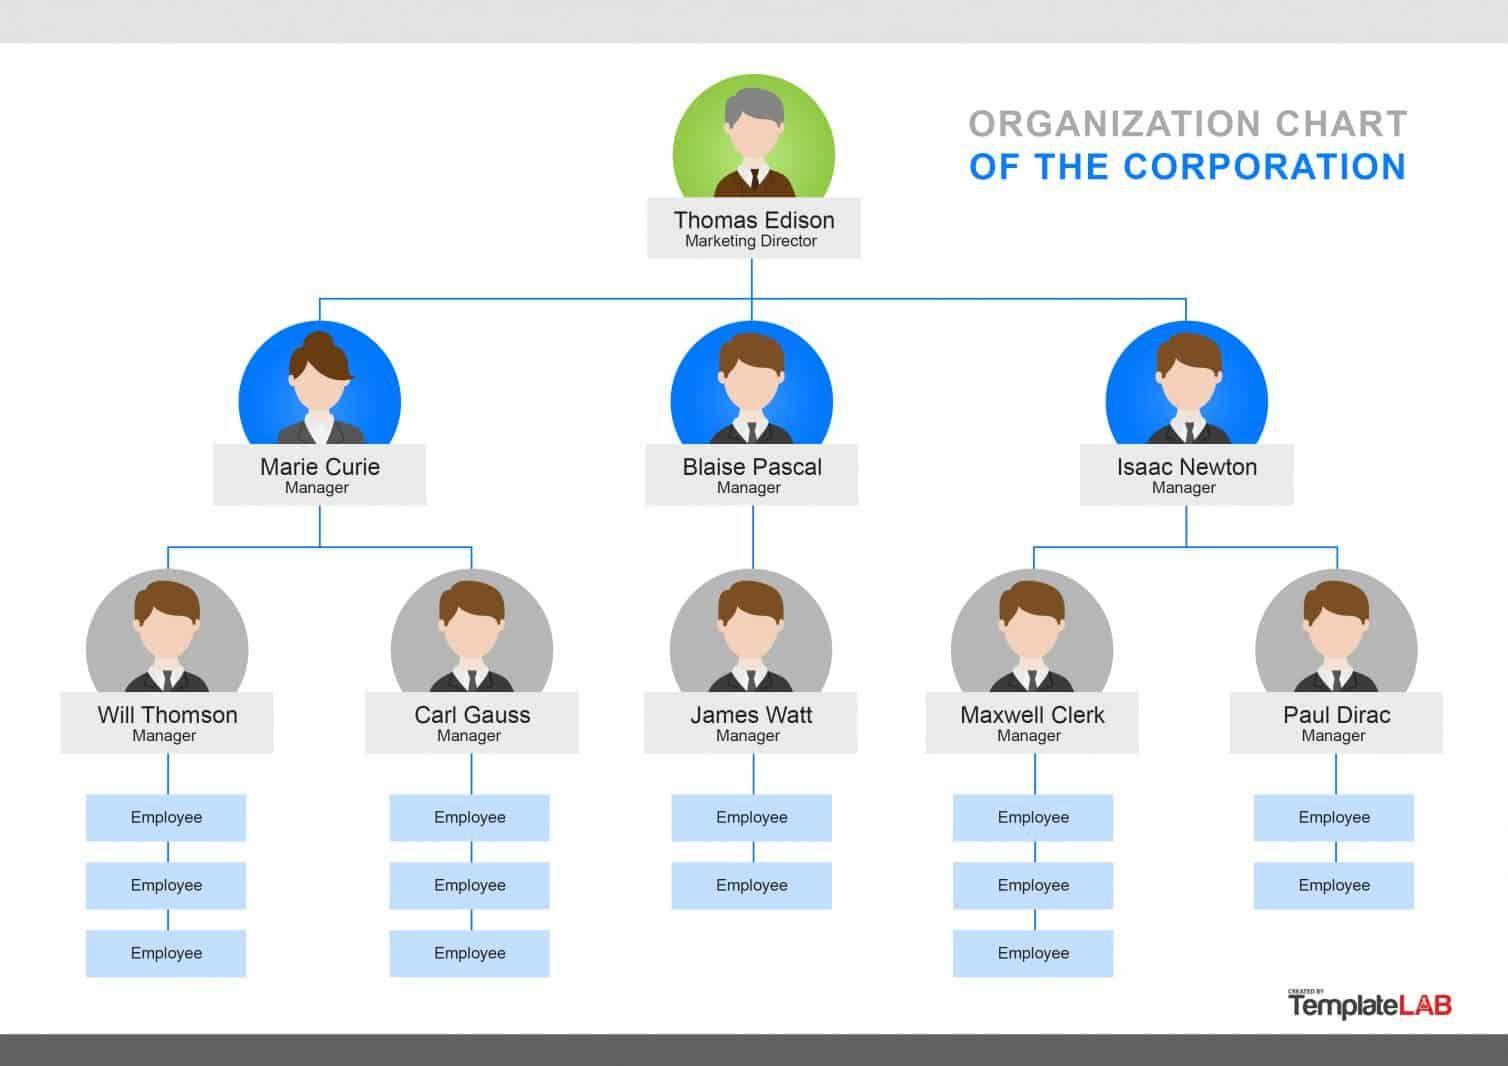 000 Stirring Organizational Chart Template Powerpoint Free Idea  Download 2010 OrganizationFull